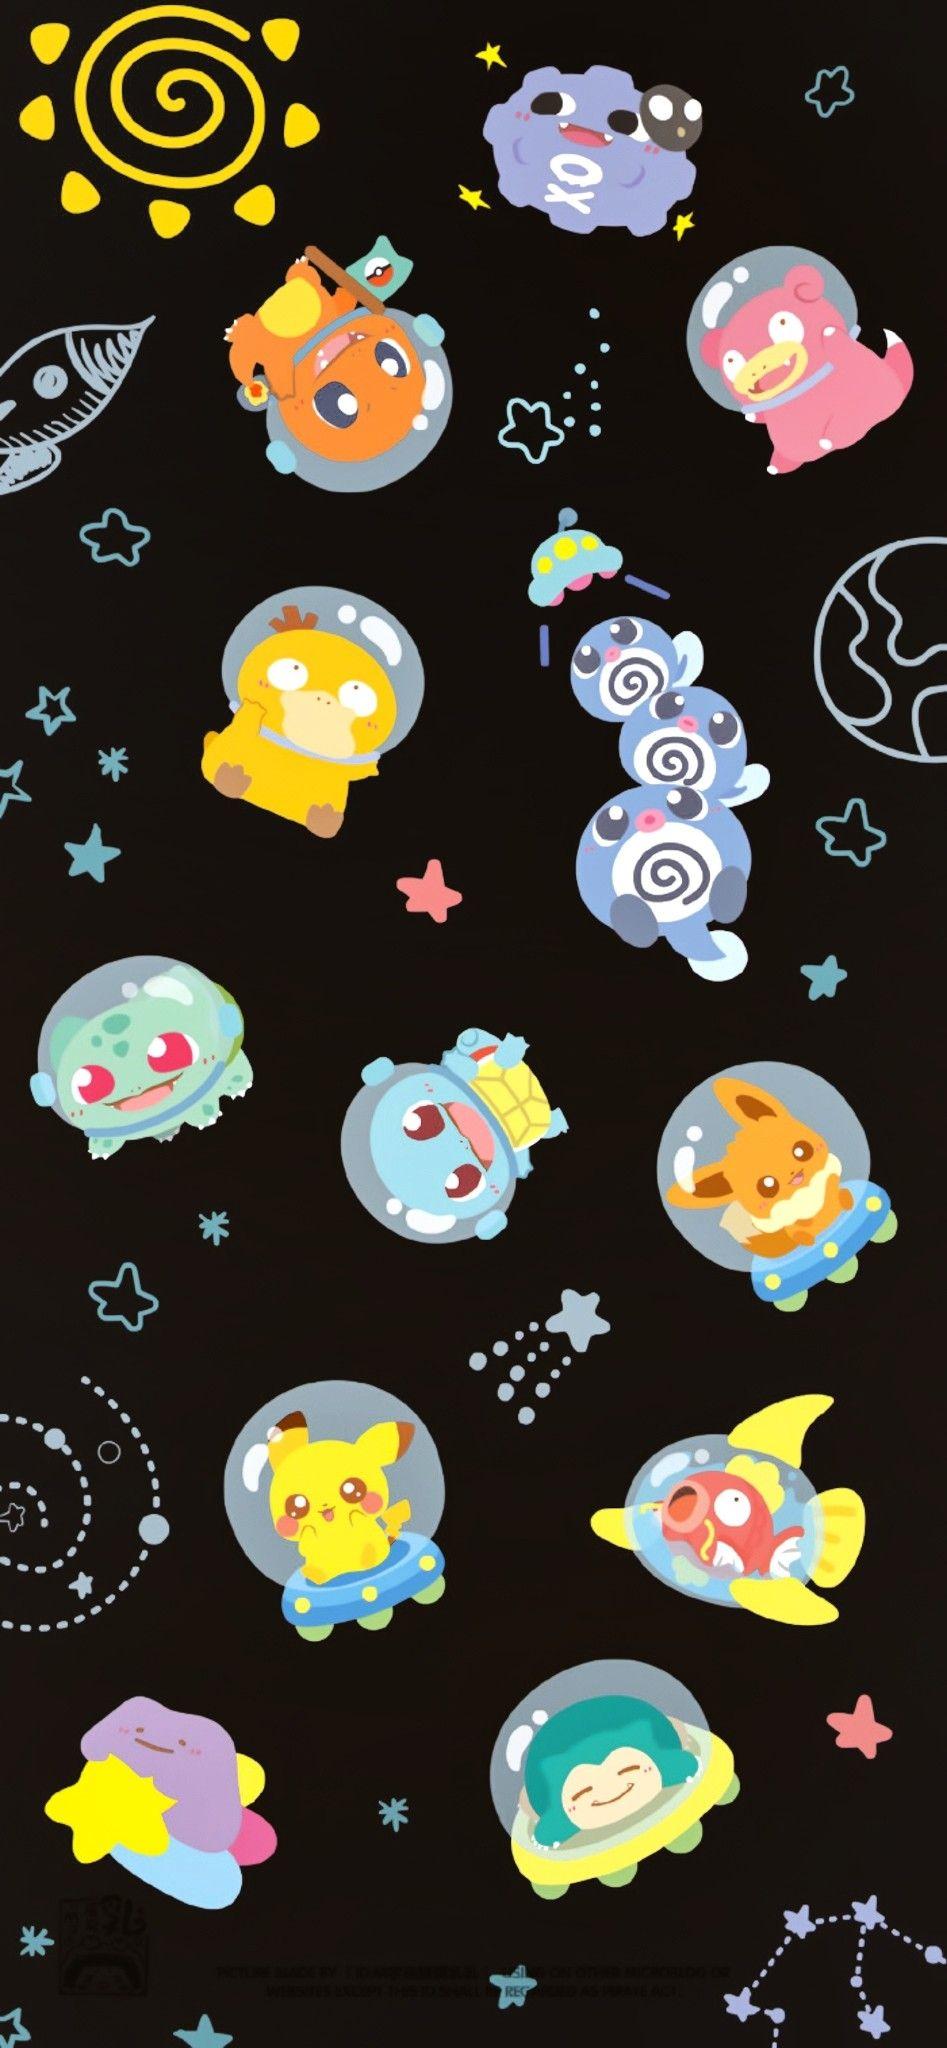 Cute Pokemon Wallpaper Pokemon Backgrounds Cute Pokemon Wallpaper Cartoon Wallpaper